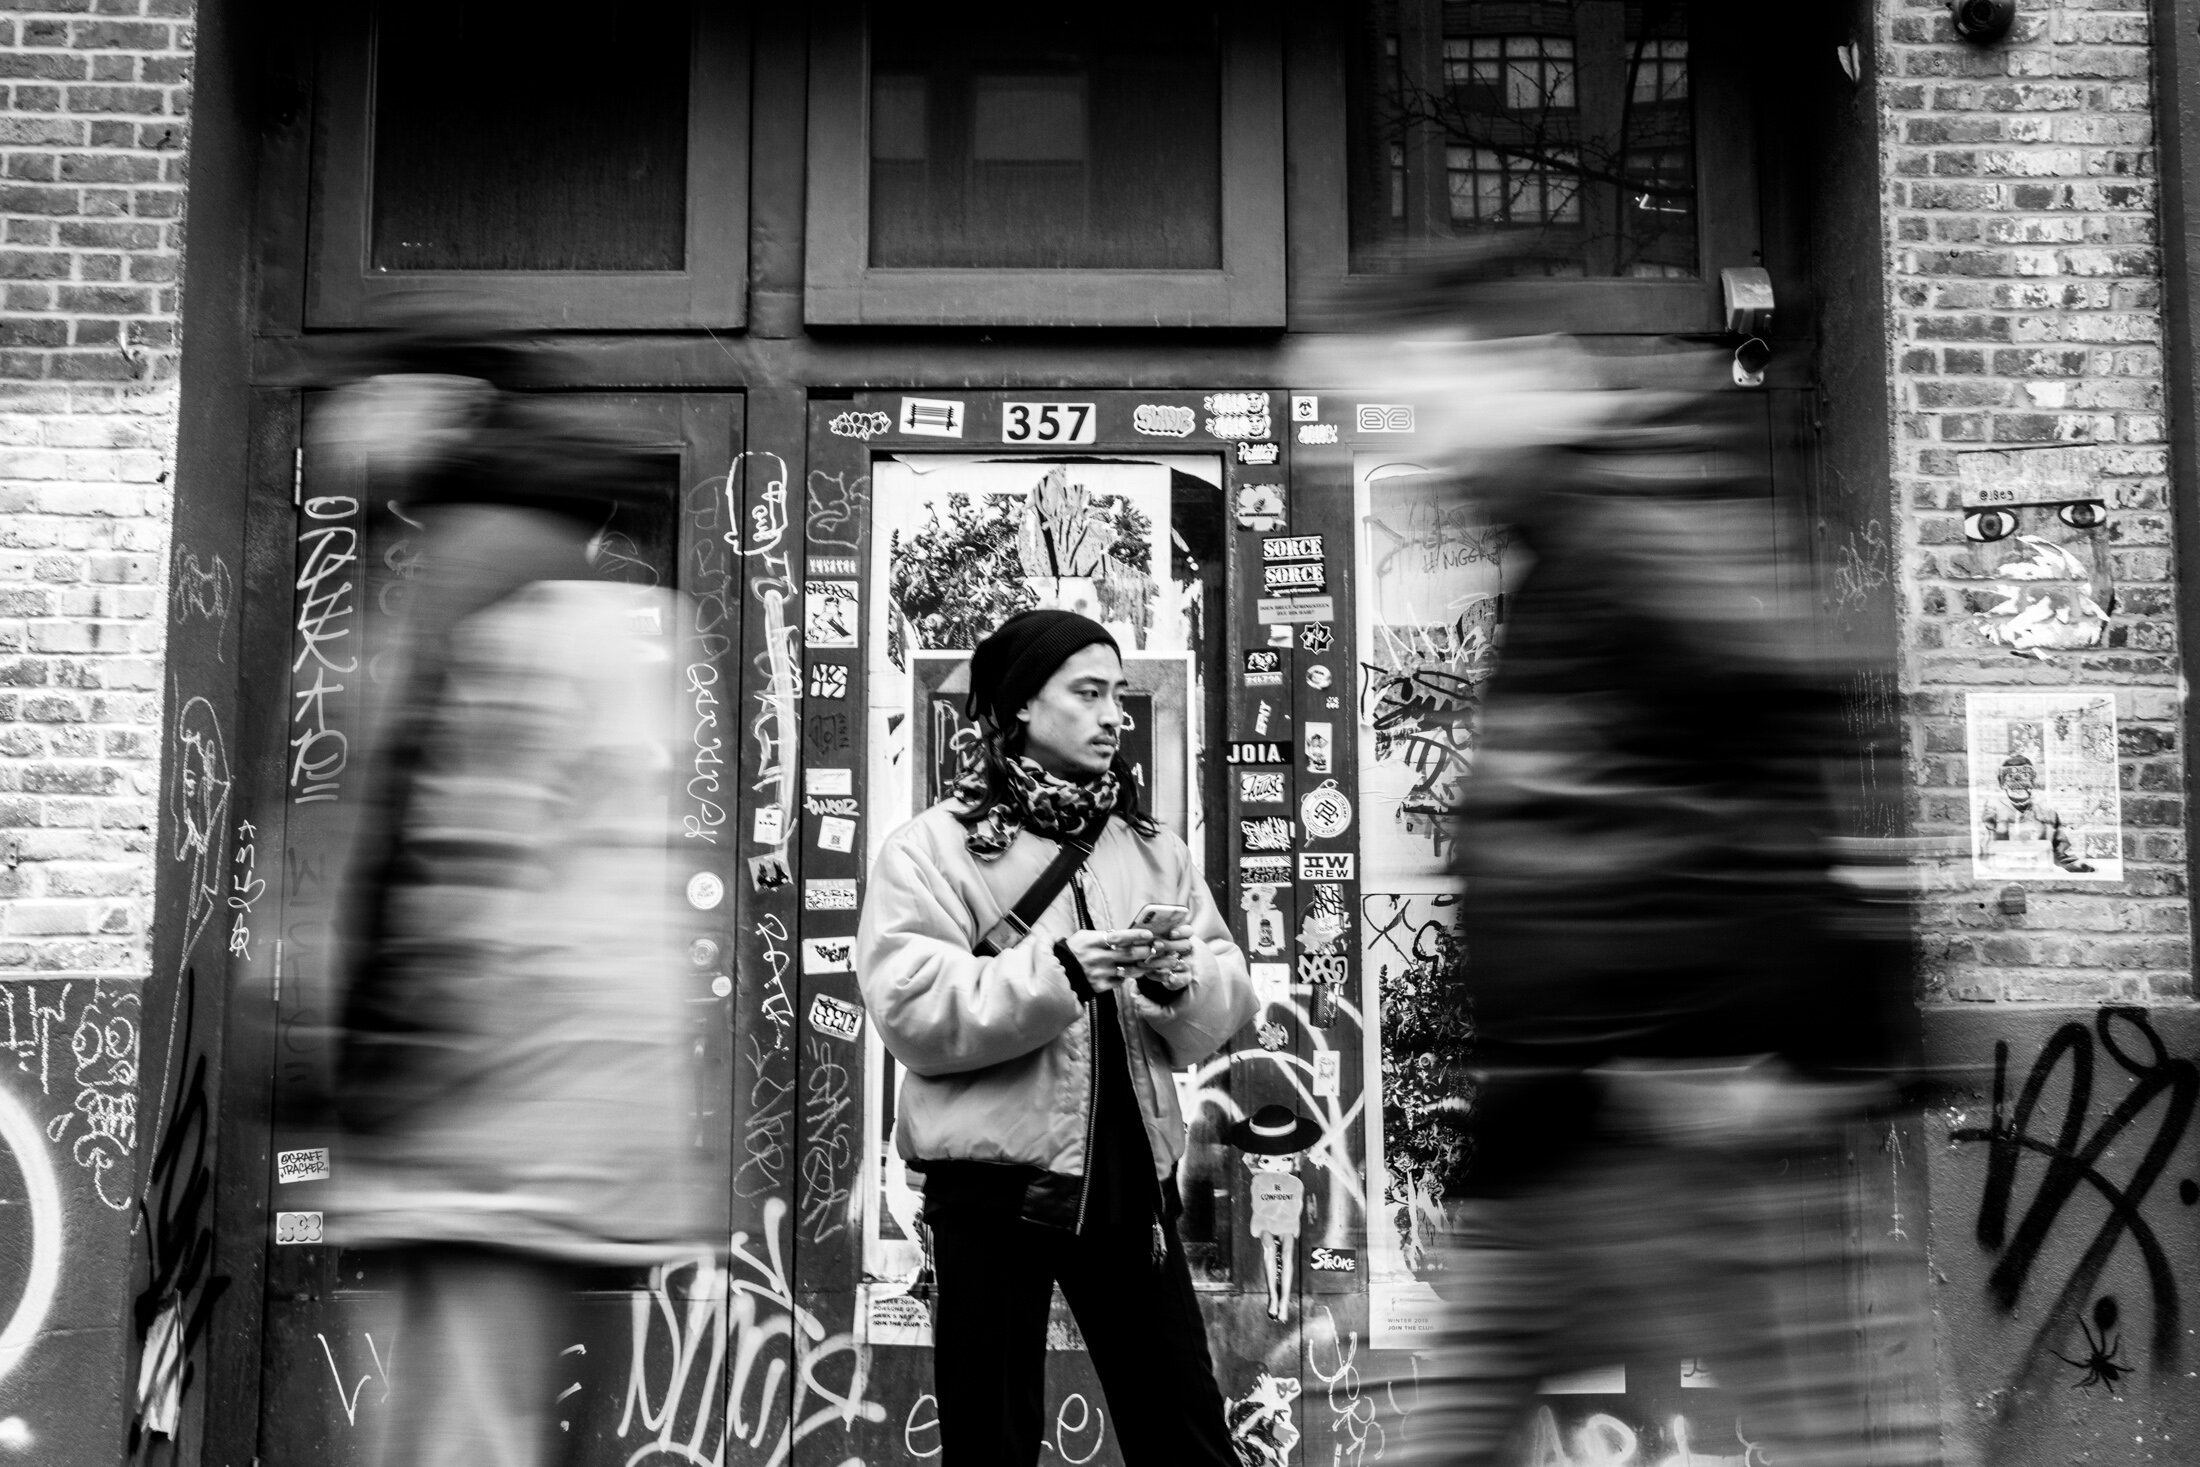 2020-01-27 BLOG Nico - Fashion - New York City, New York - Jack Robert Photography-24.jpg